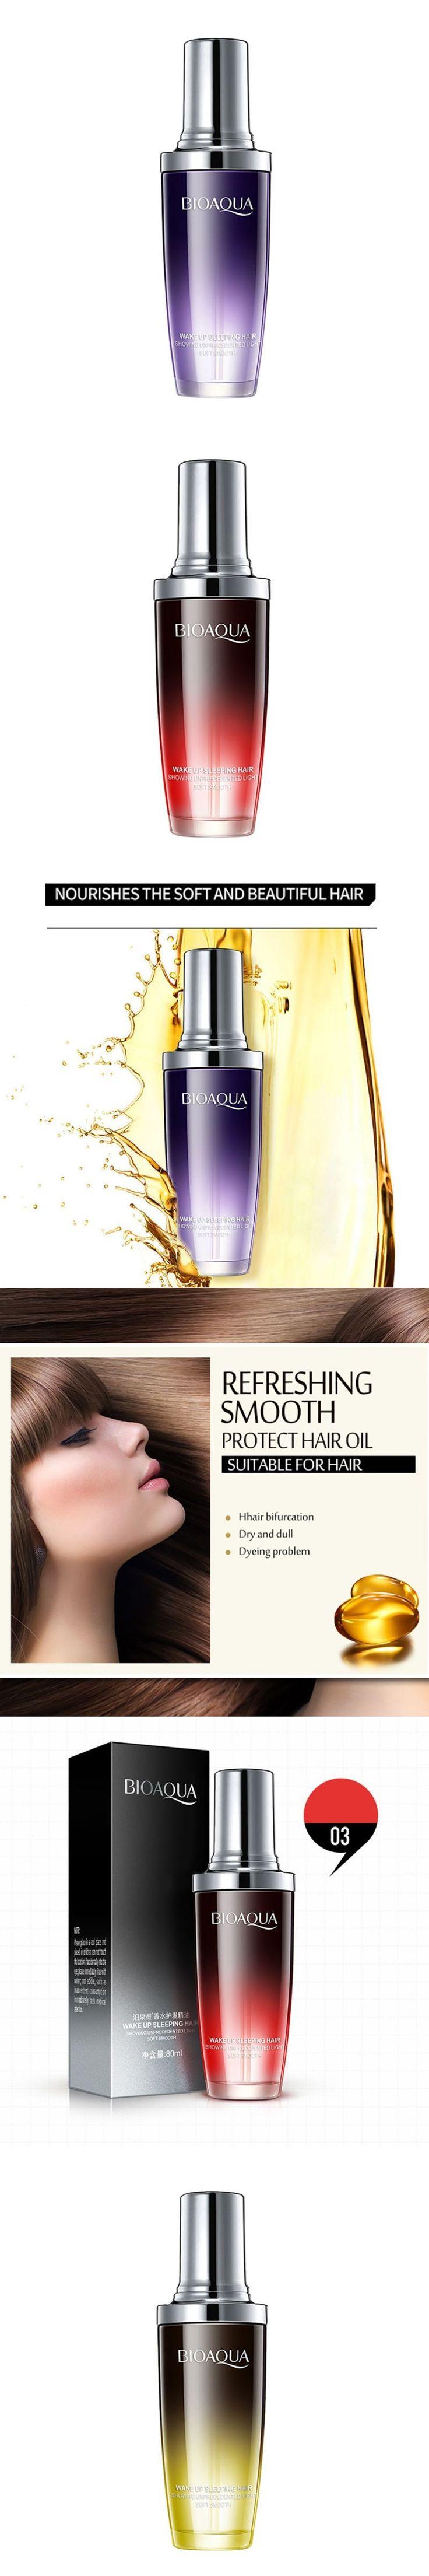 New Perfume Essential Oil Moroccan Argan Oil Hair Care Keratin Shine Oil Treatment Straightener Soft Dry Hair Typ Improve Hairy